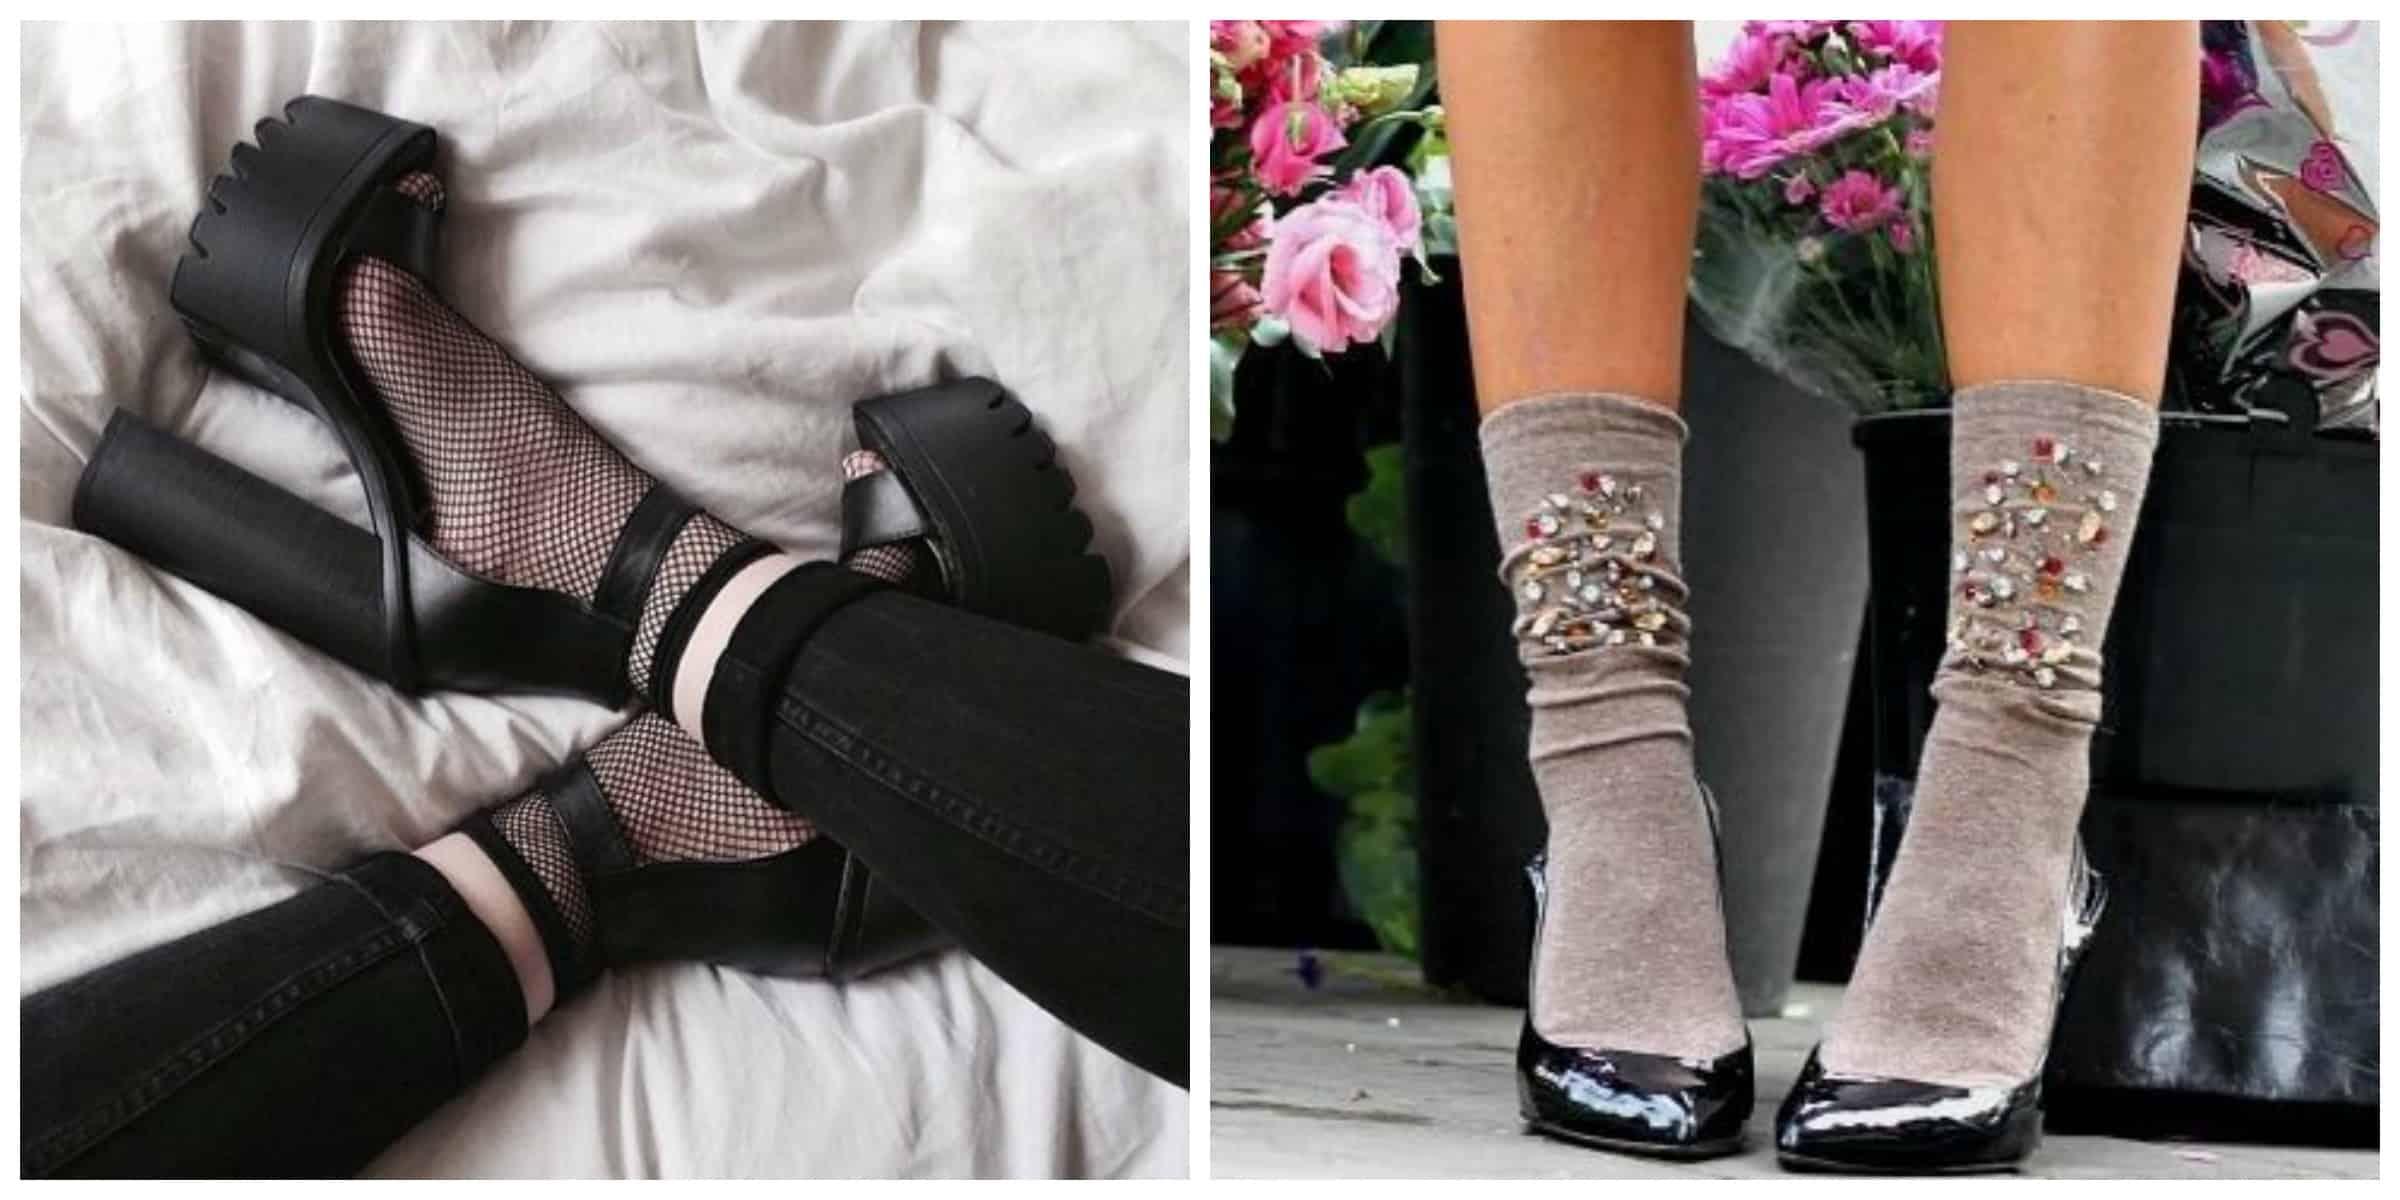 socks-and-heel-shoes